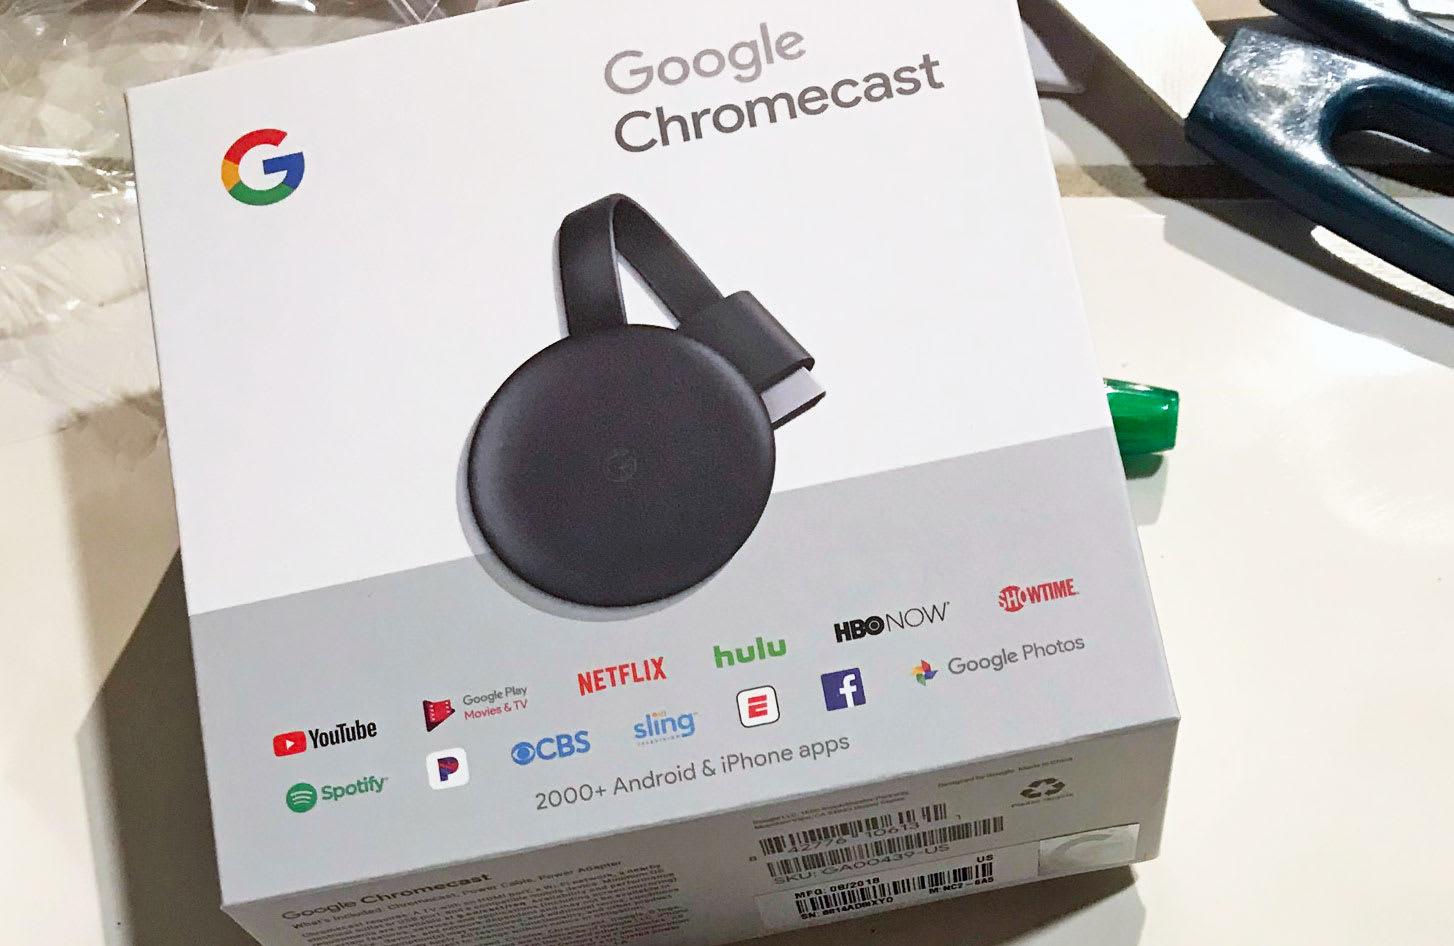 Best Buy inadvertently sold Google's next-gen Chromecast